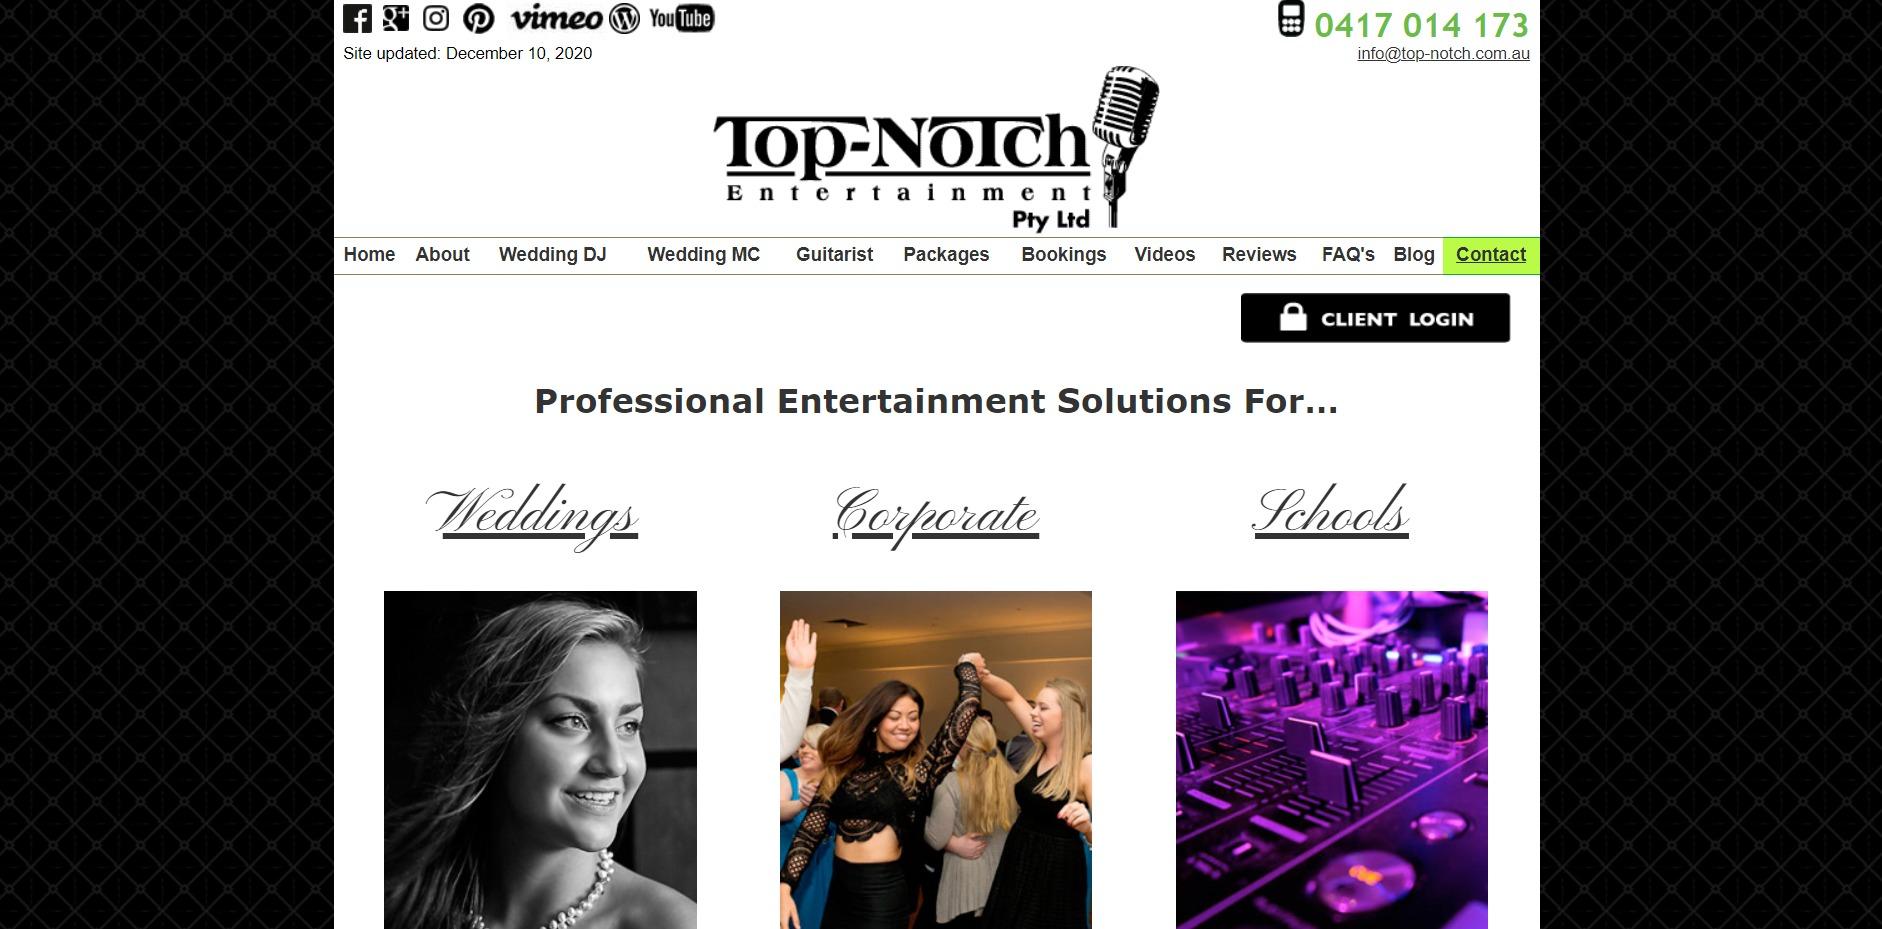 Top Notch Entertainment Pty